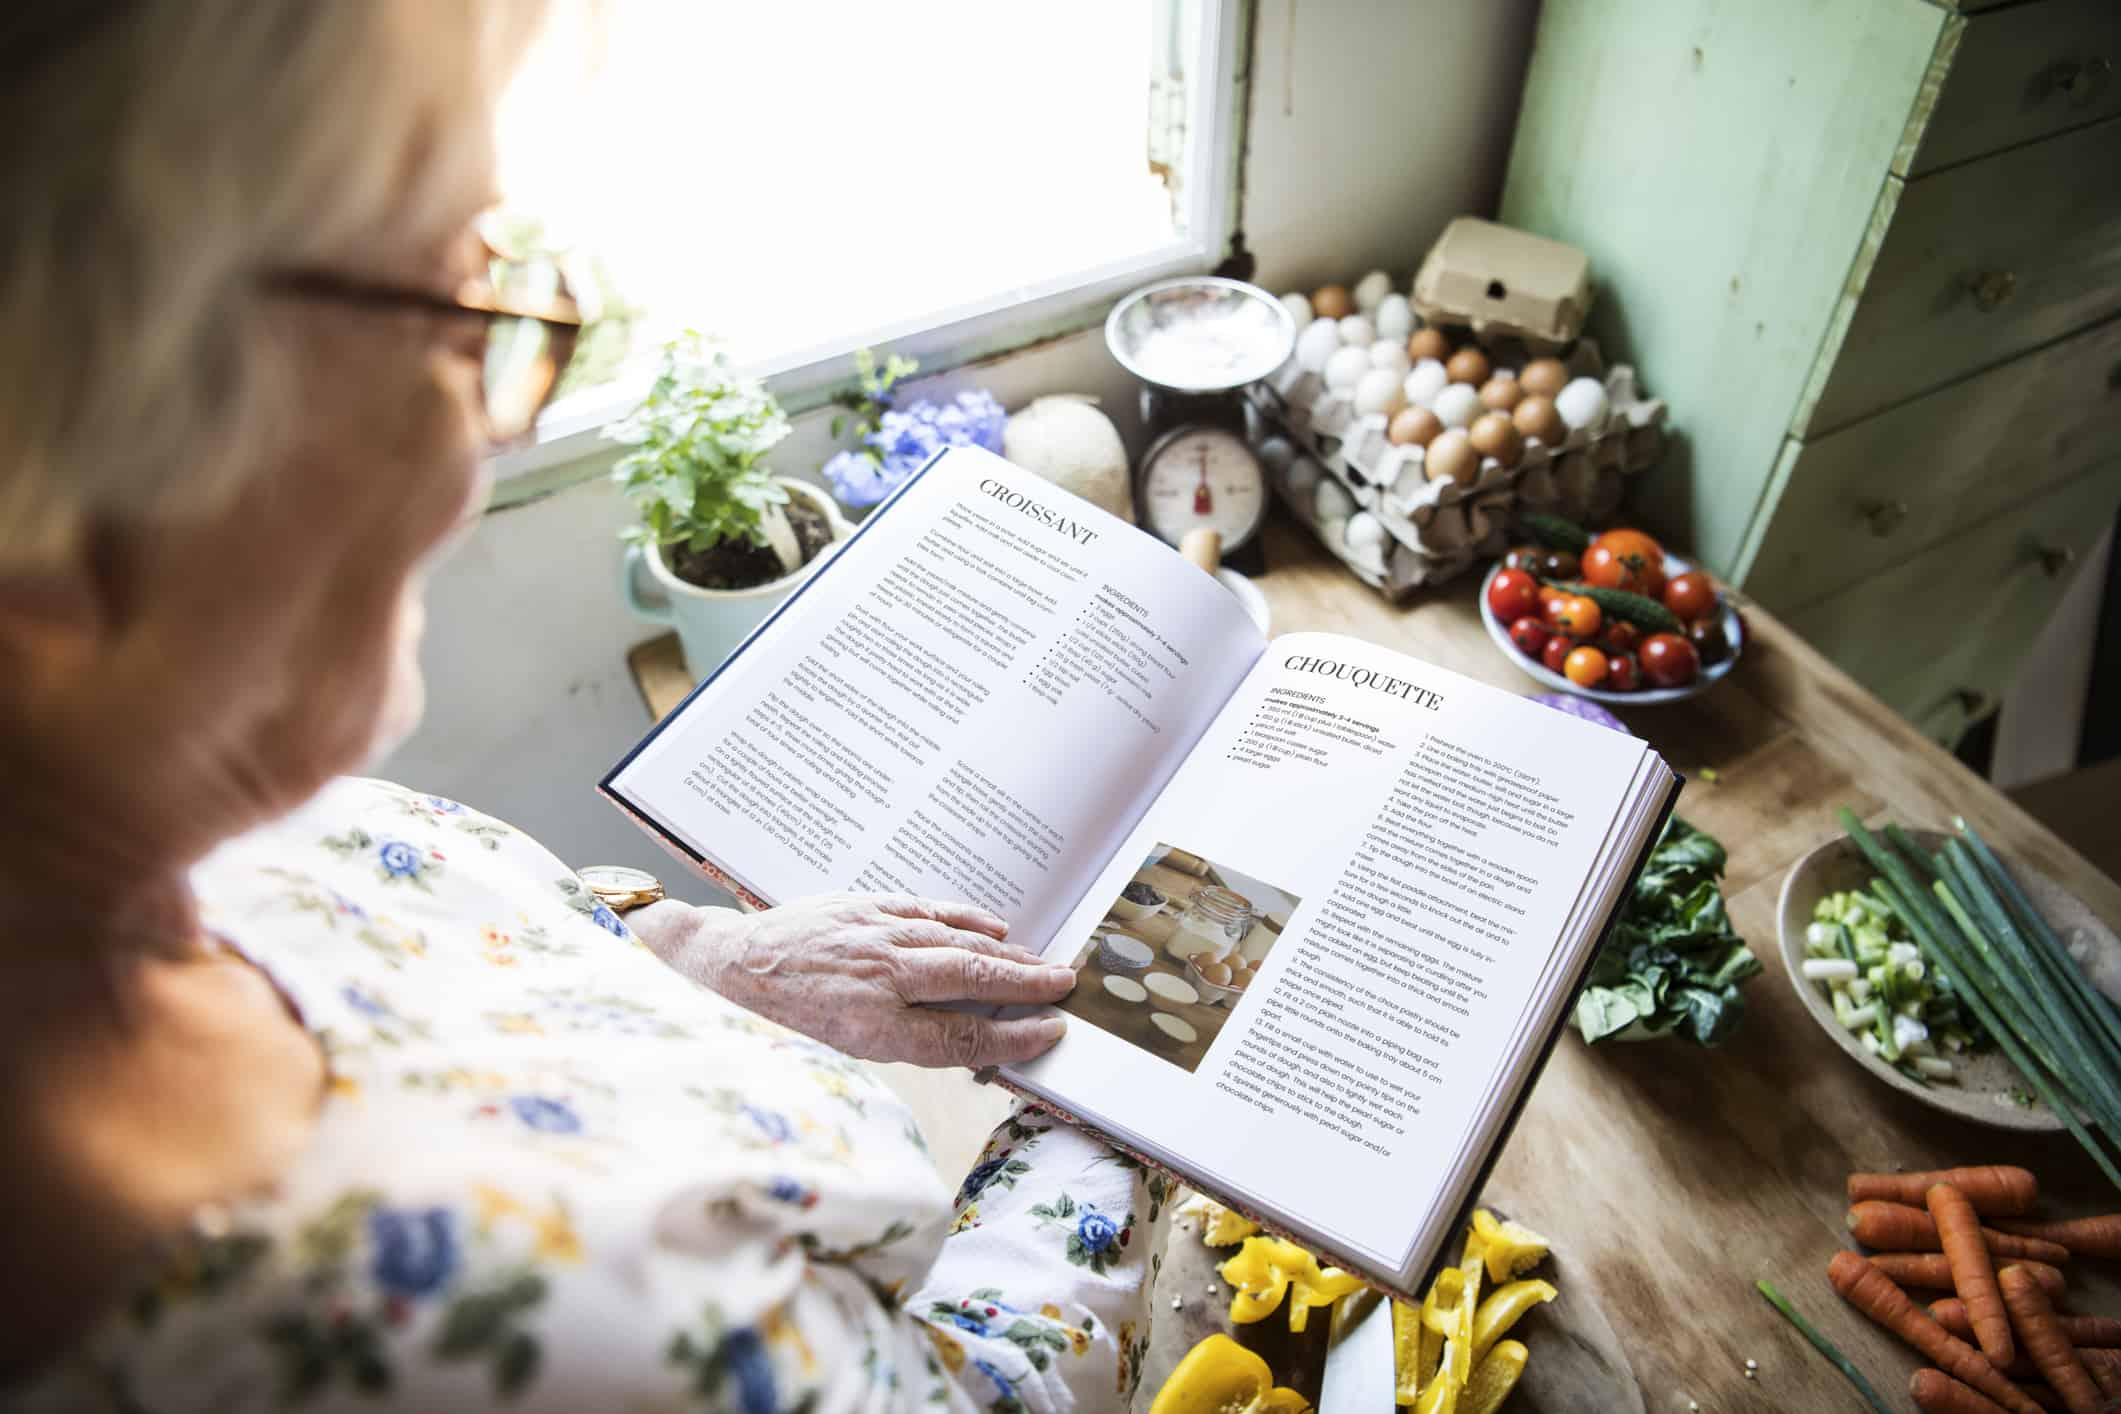 Happy elderly woman reading a cookbook